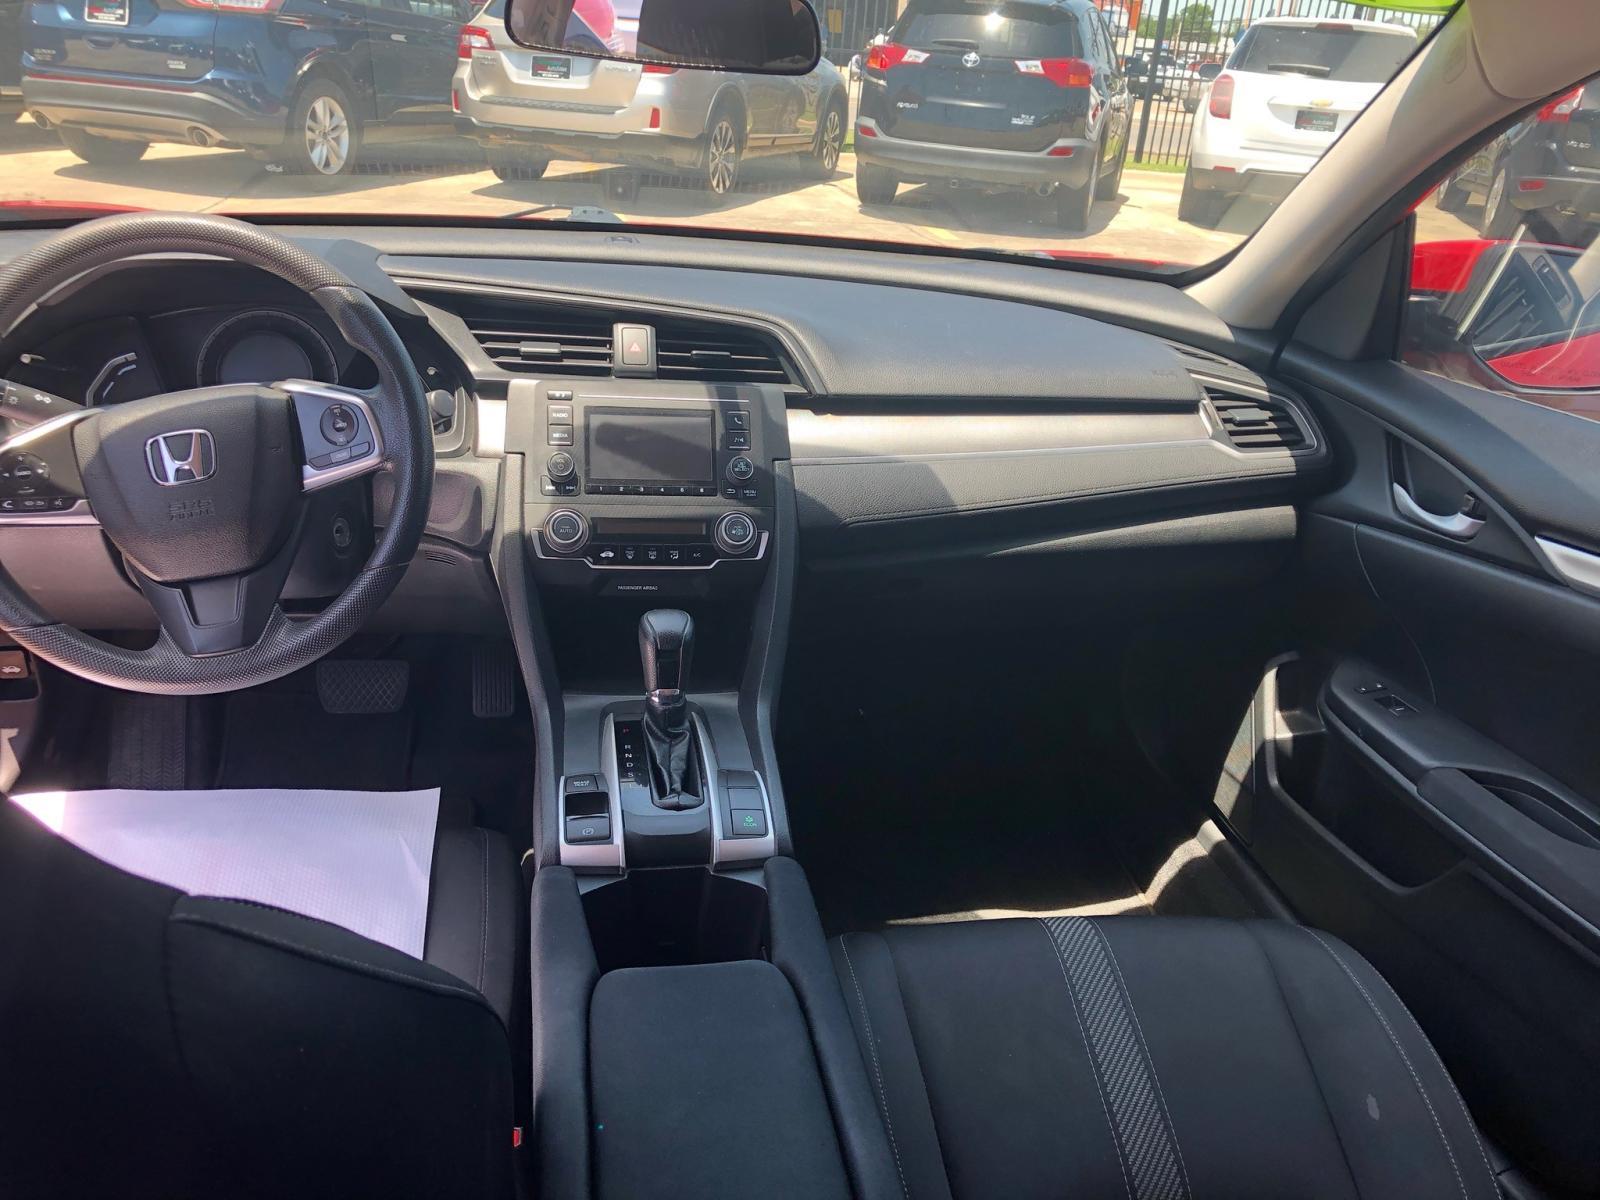 2016 Honda Civic Lx 2.0L engine view